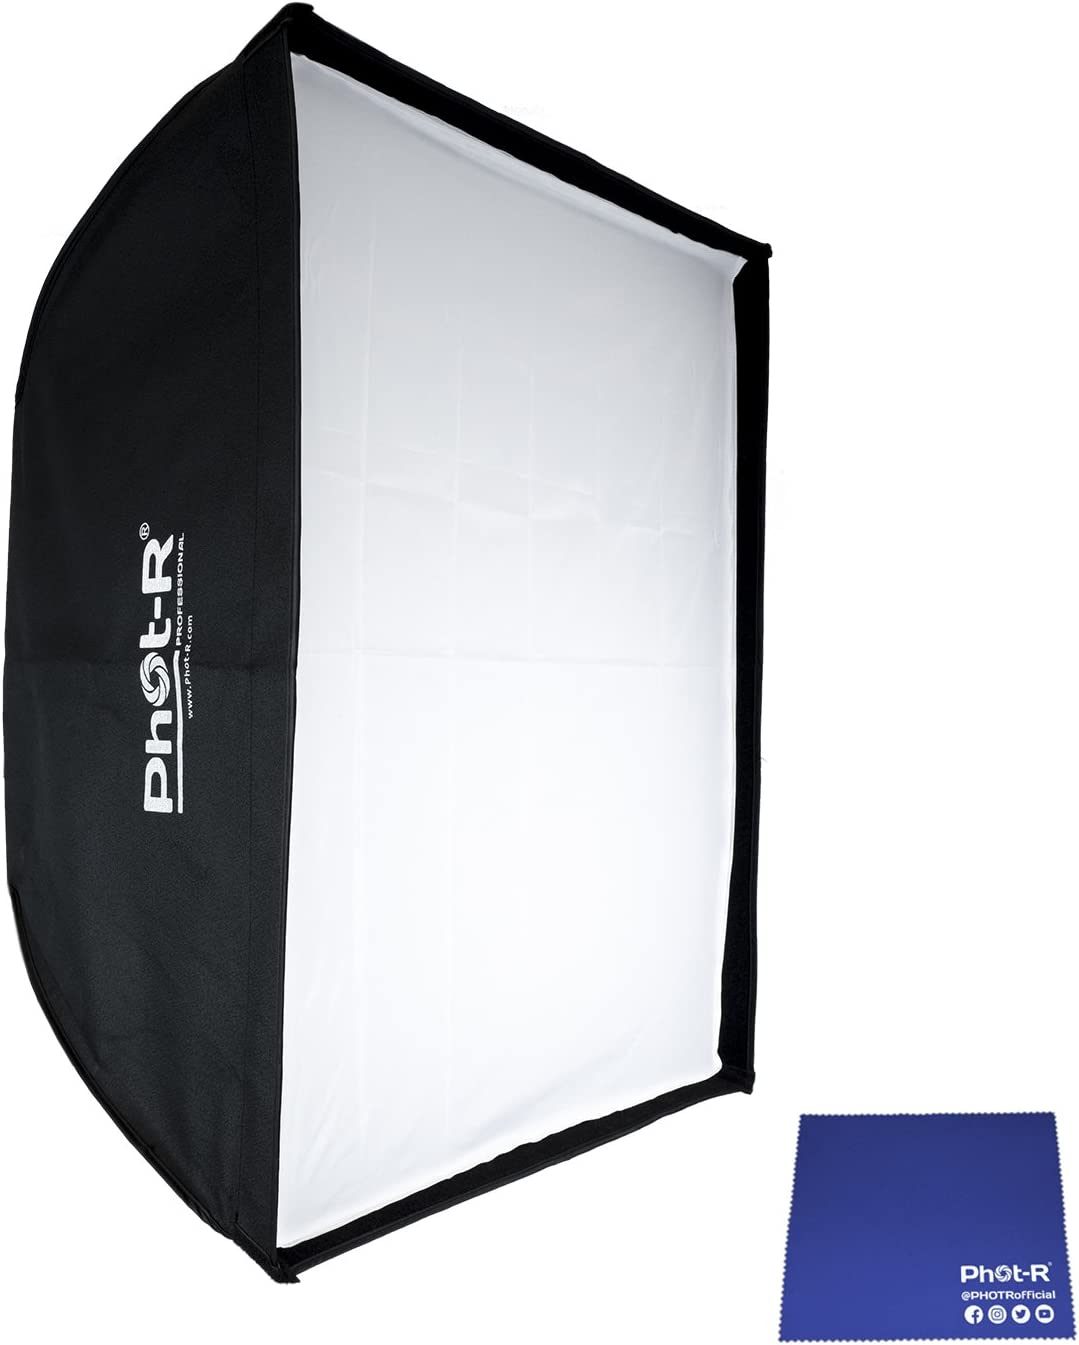 Phot-R Professional 22 x 90 cm Rectangular Folding Umbrella Strip Softbox and Honeycomb Grid with Bowens S Type Mount Speedring Studio Strobe Flash Chamois Cloth